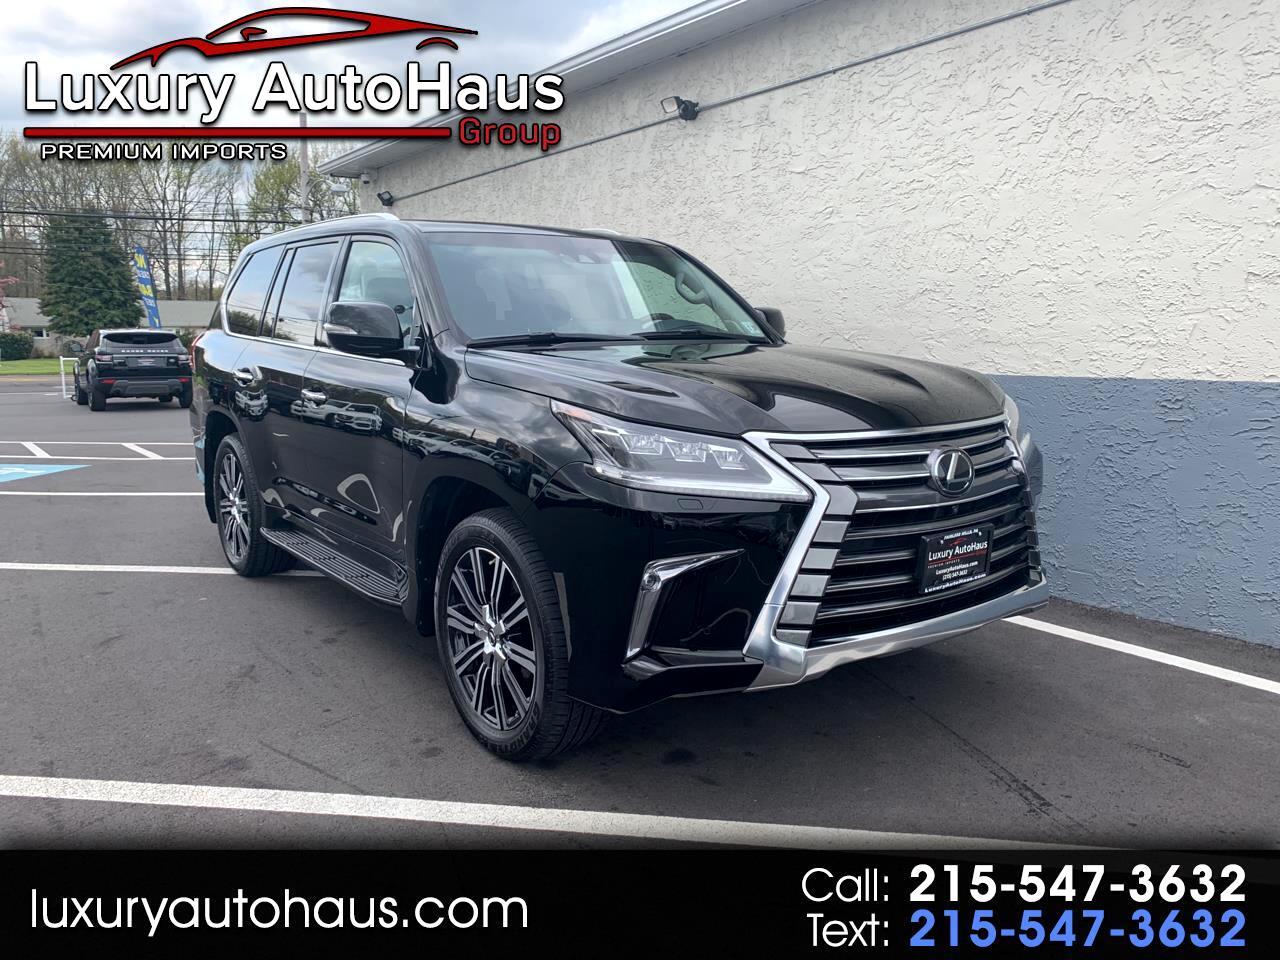 Lexus LX 570 Three-Row 2018